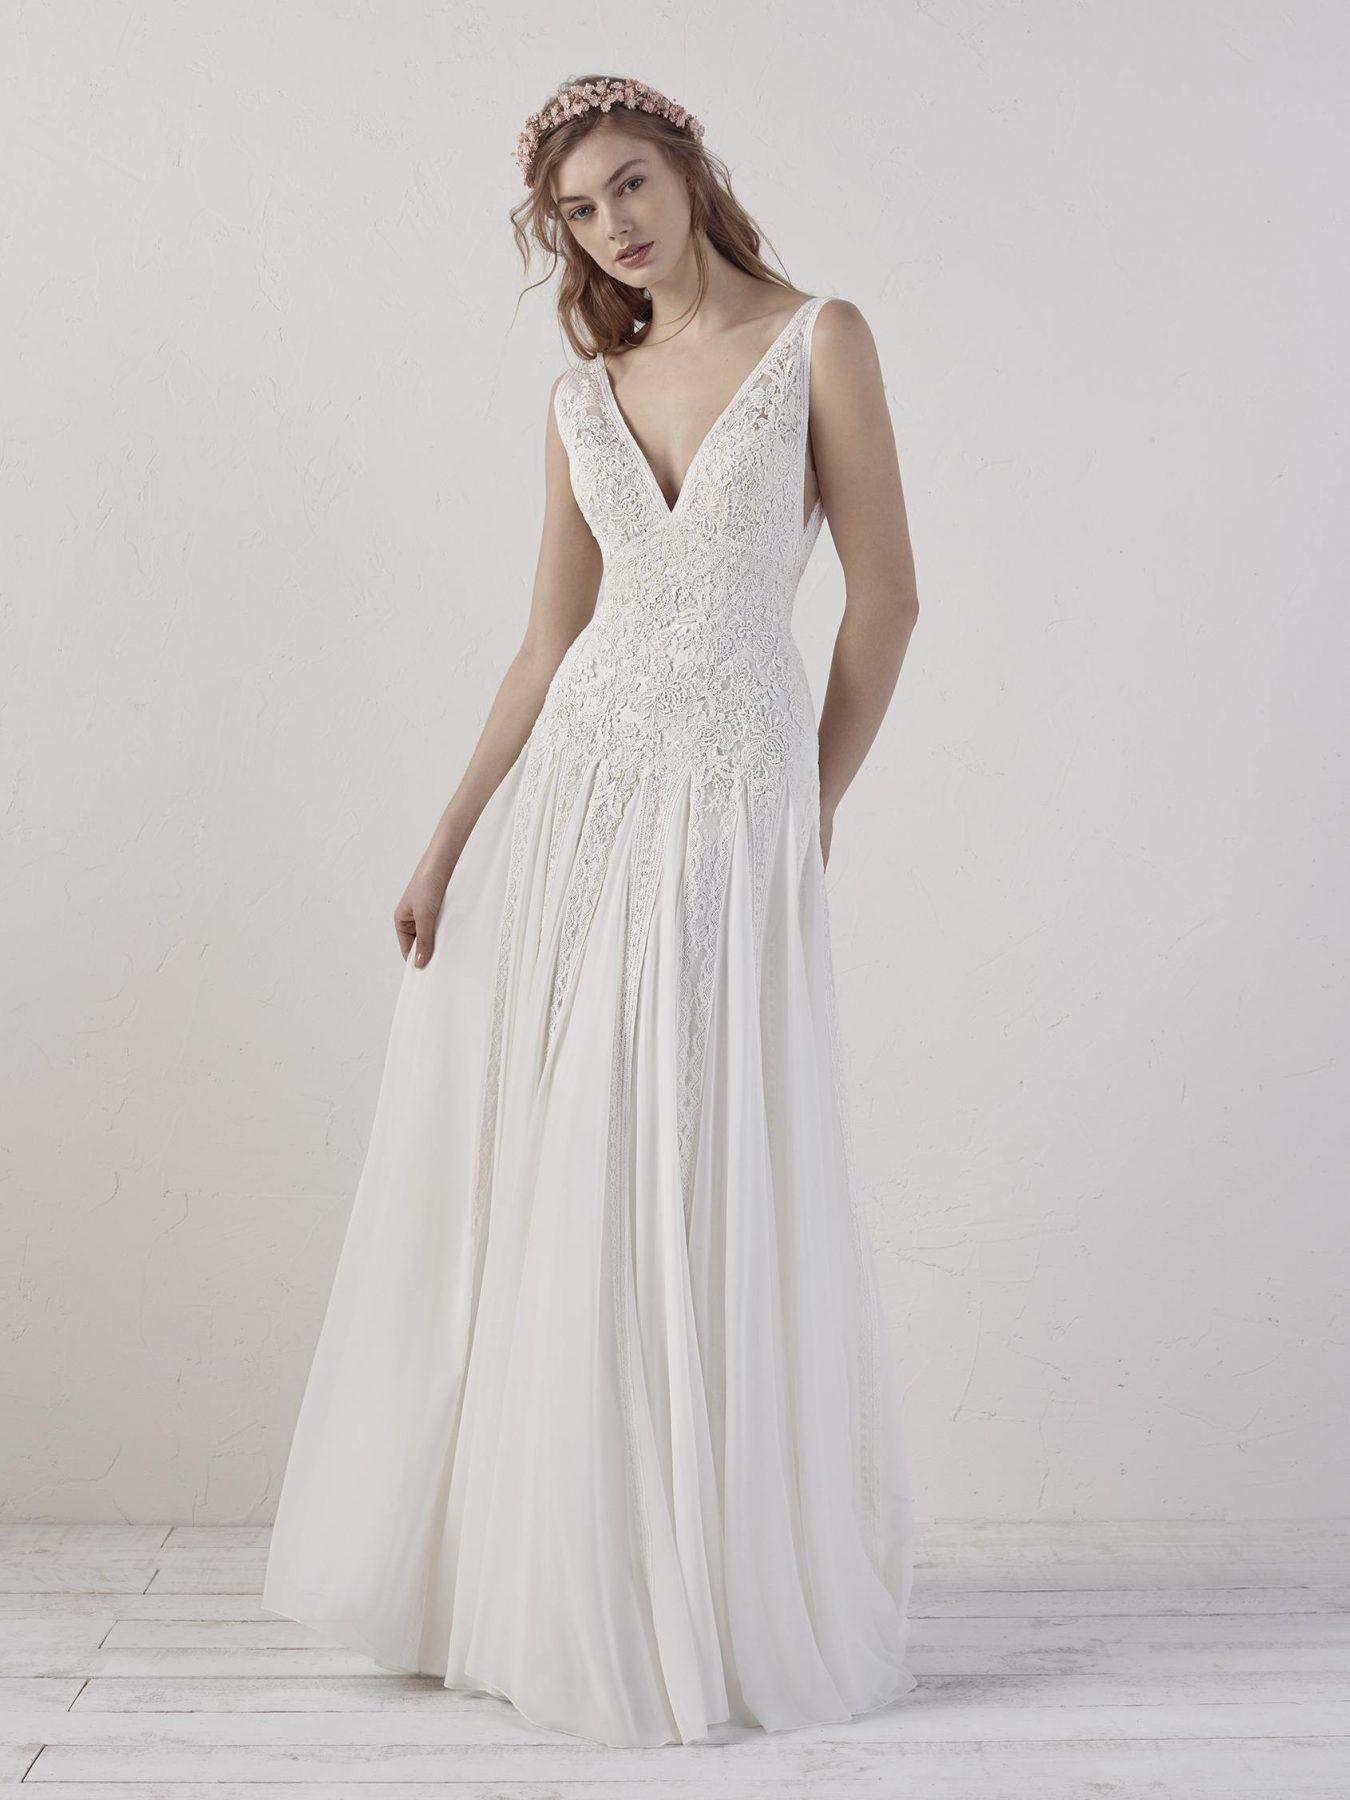 Lace Sleeveless V Neck A Line Wedding Dress Pronovias Style Eileen Wedding Dresses Pronovias Wedding Dress Boho Chic Wedding Dress [ 1800 x 1350 Pixel ]